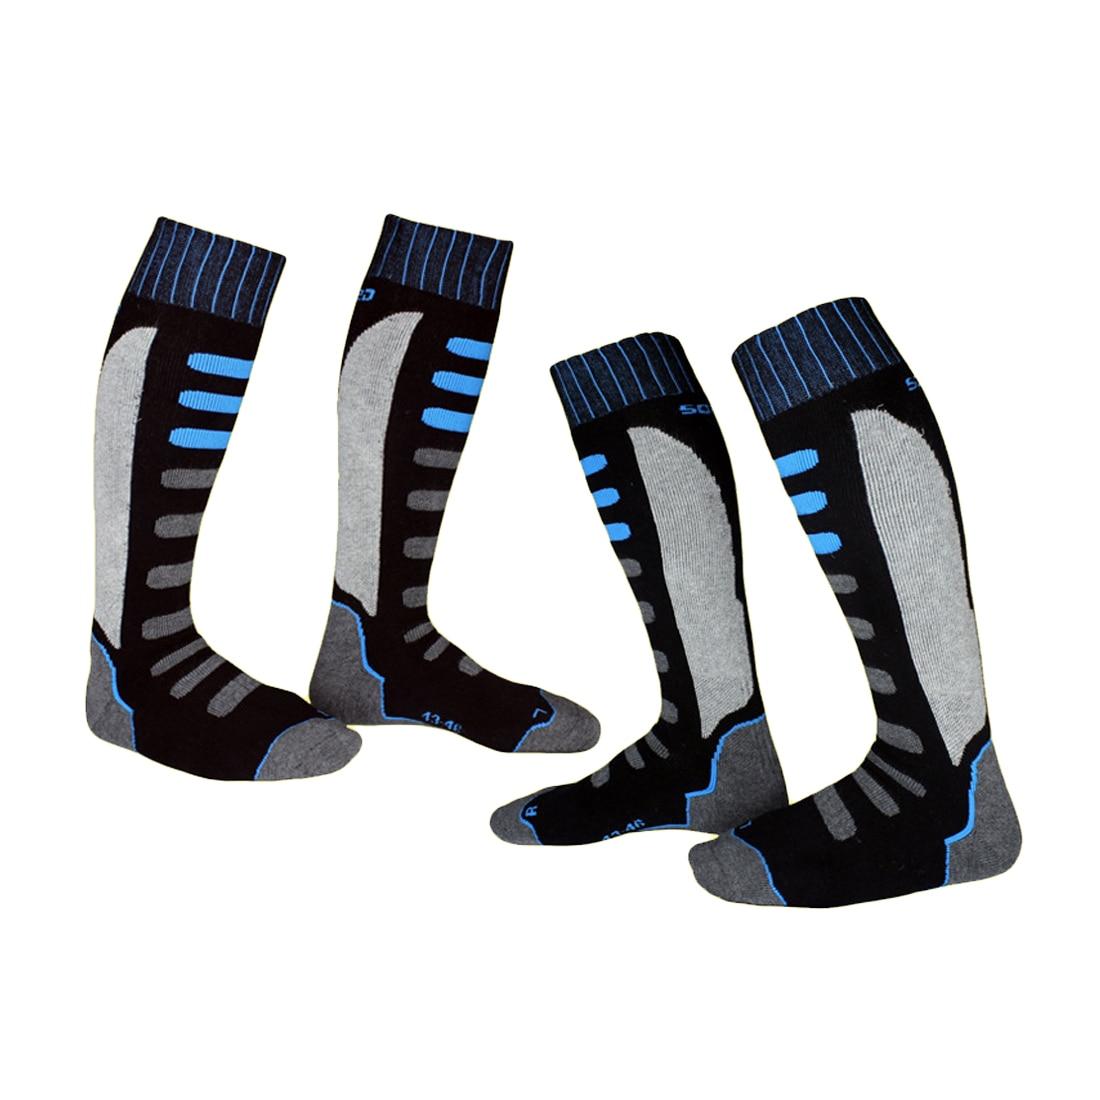 New Winter Warm Men Thermal Ski Socks Thick Cotton Sports Snowboard Cycling Skiing Soccer Socks Thermosocks Leg Warmers Sox